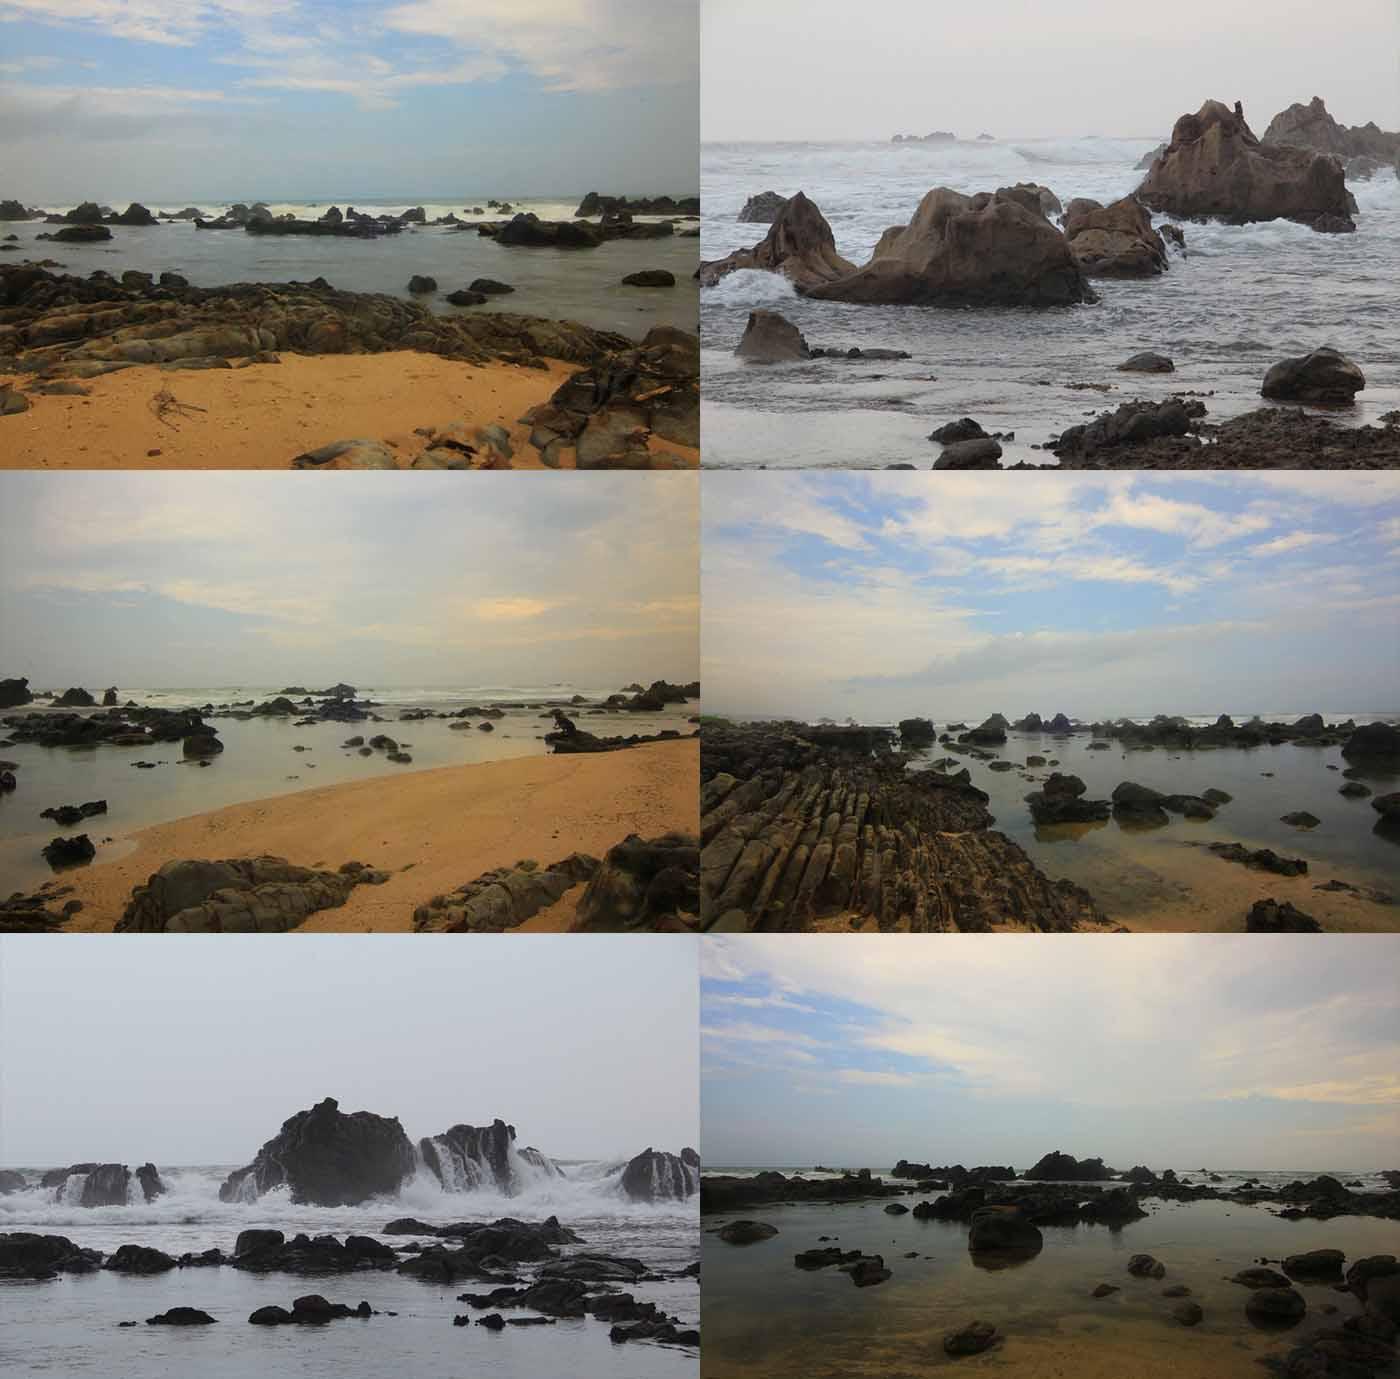 Wisata Pantai Karang Songsong Lebak Banten Kamera Budaya Suasana Karangsongsong